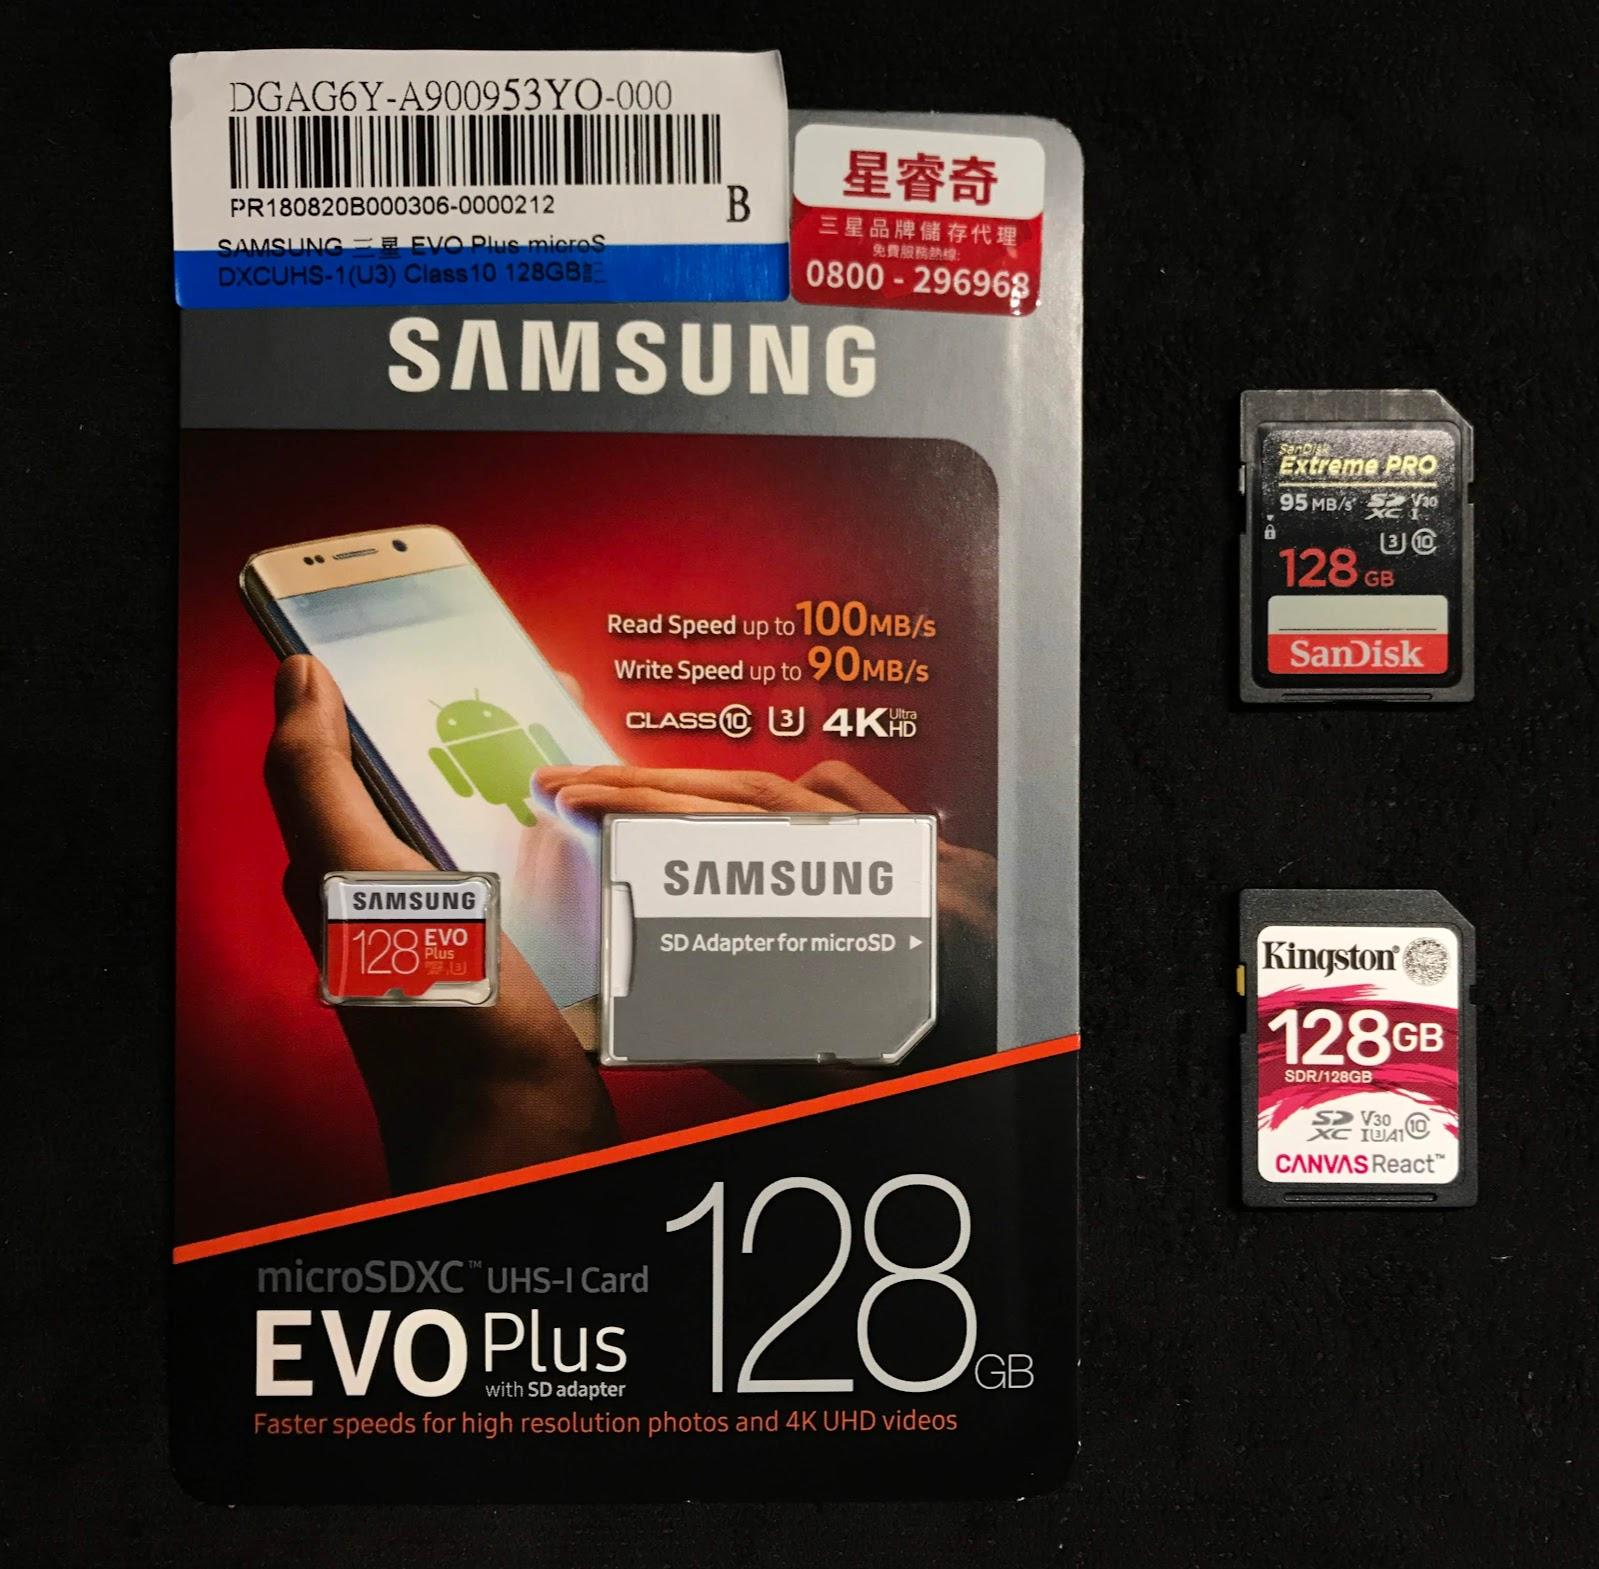 3c Samsung Evo Plus Microsd 128gb Micro Sd 128 Gb 100 90 Sandisk Extreme Pro Sdxc U3 V30 95 Kingston Canvas React 80